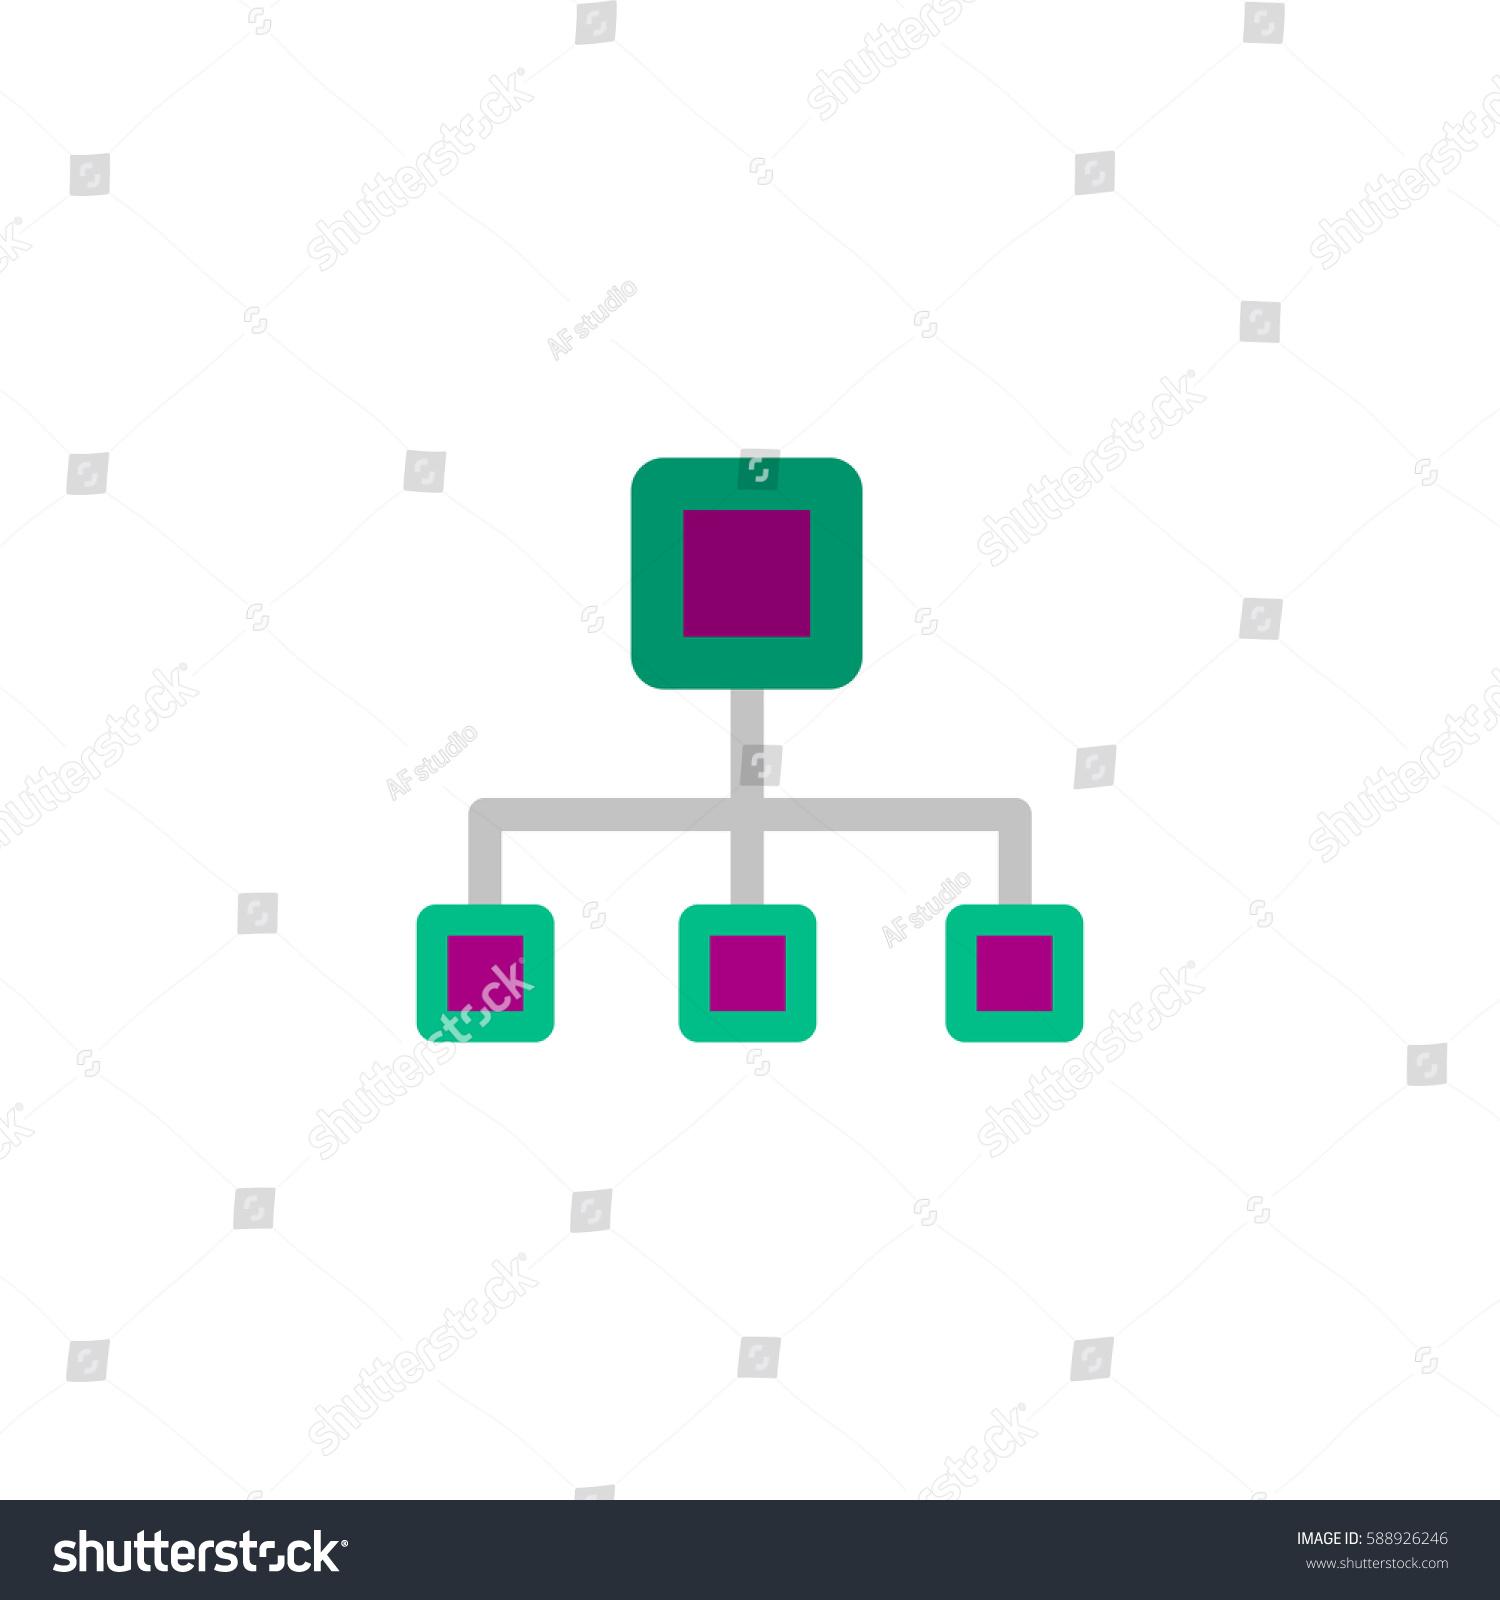 Great 83 astonishing online network diagram tool image ideas 83 astonishing online network diagram tool image ideas dolgular pooptronica